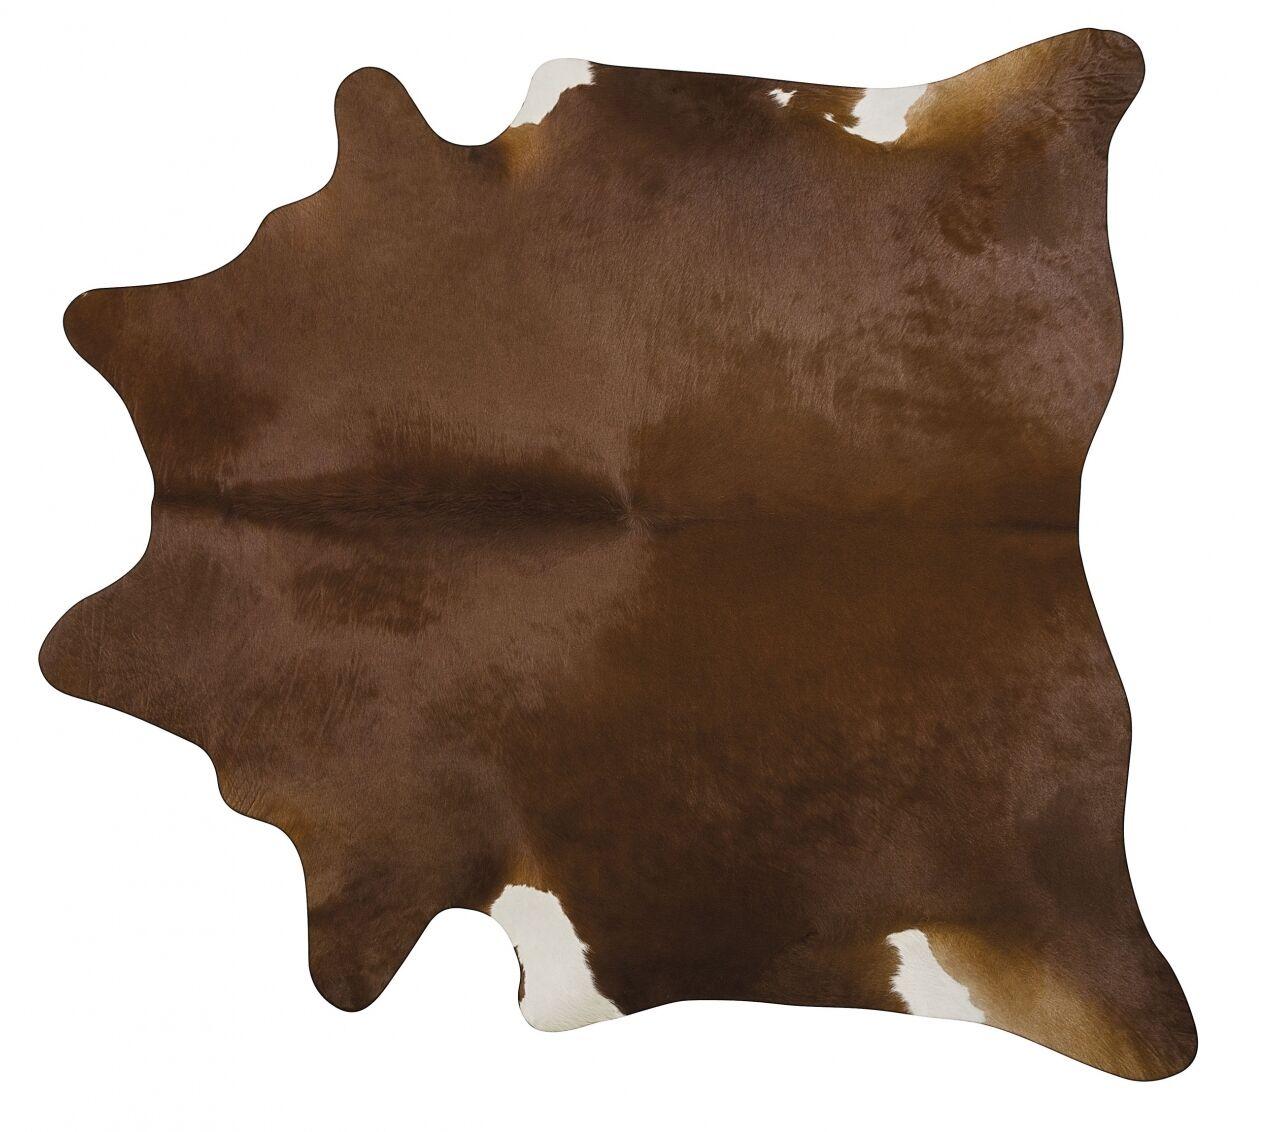 Handmade Brown Area Rug Rug Size: 7' x 7'6